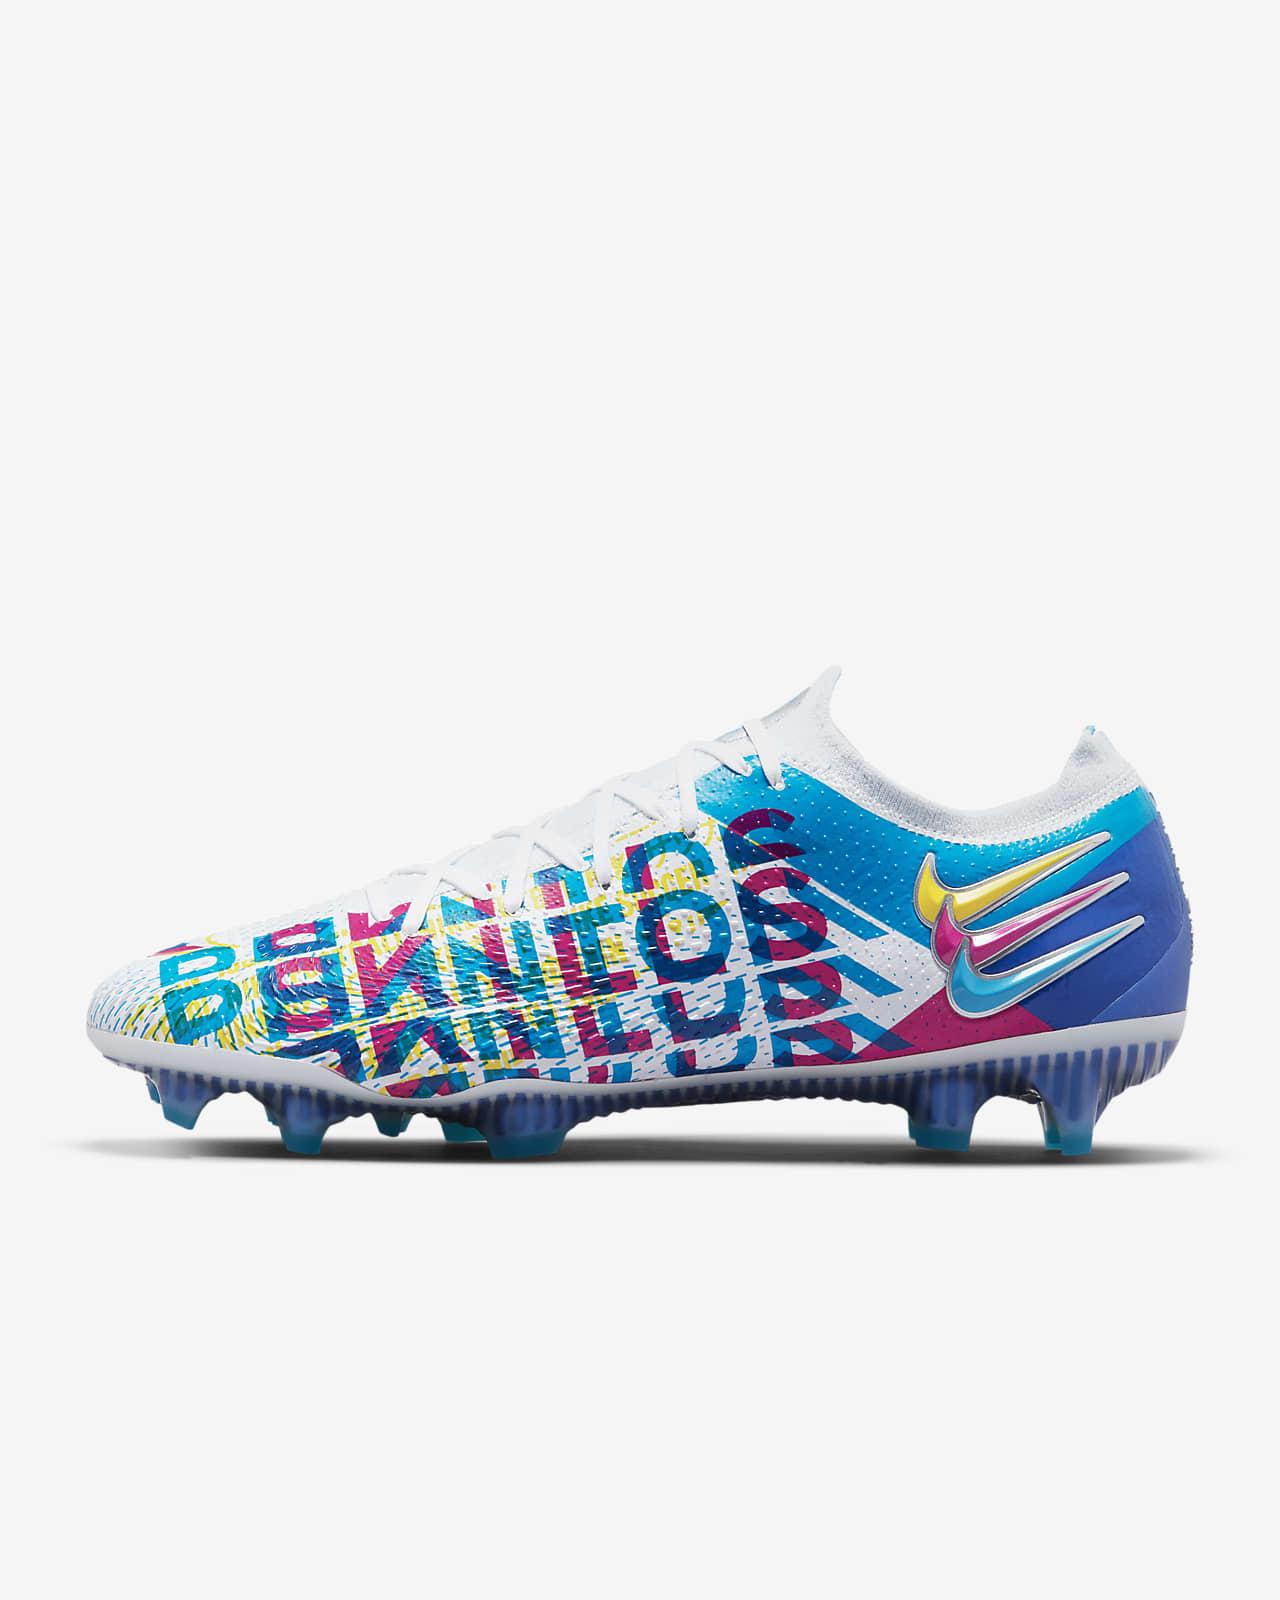 Scarpa da calcio per terreni duri Nike Phantom GT Elite 3D FG